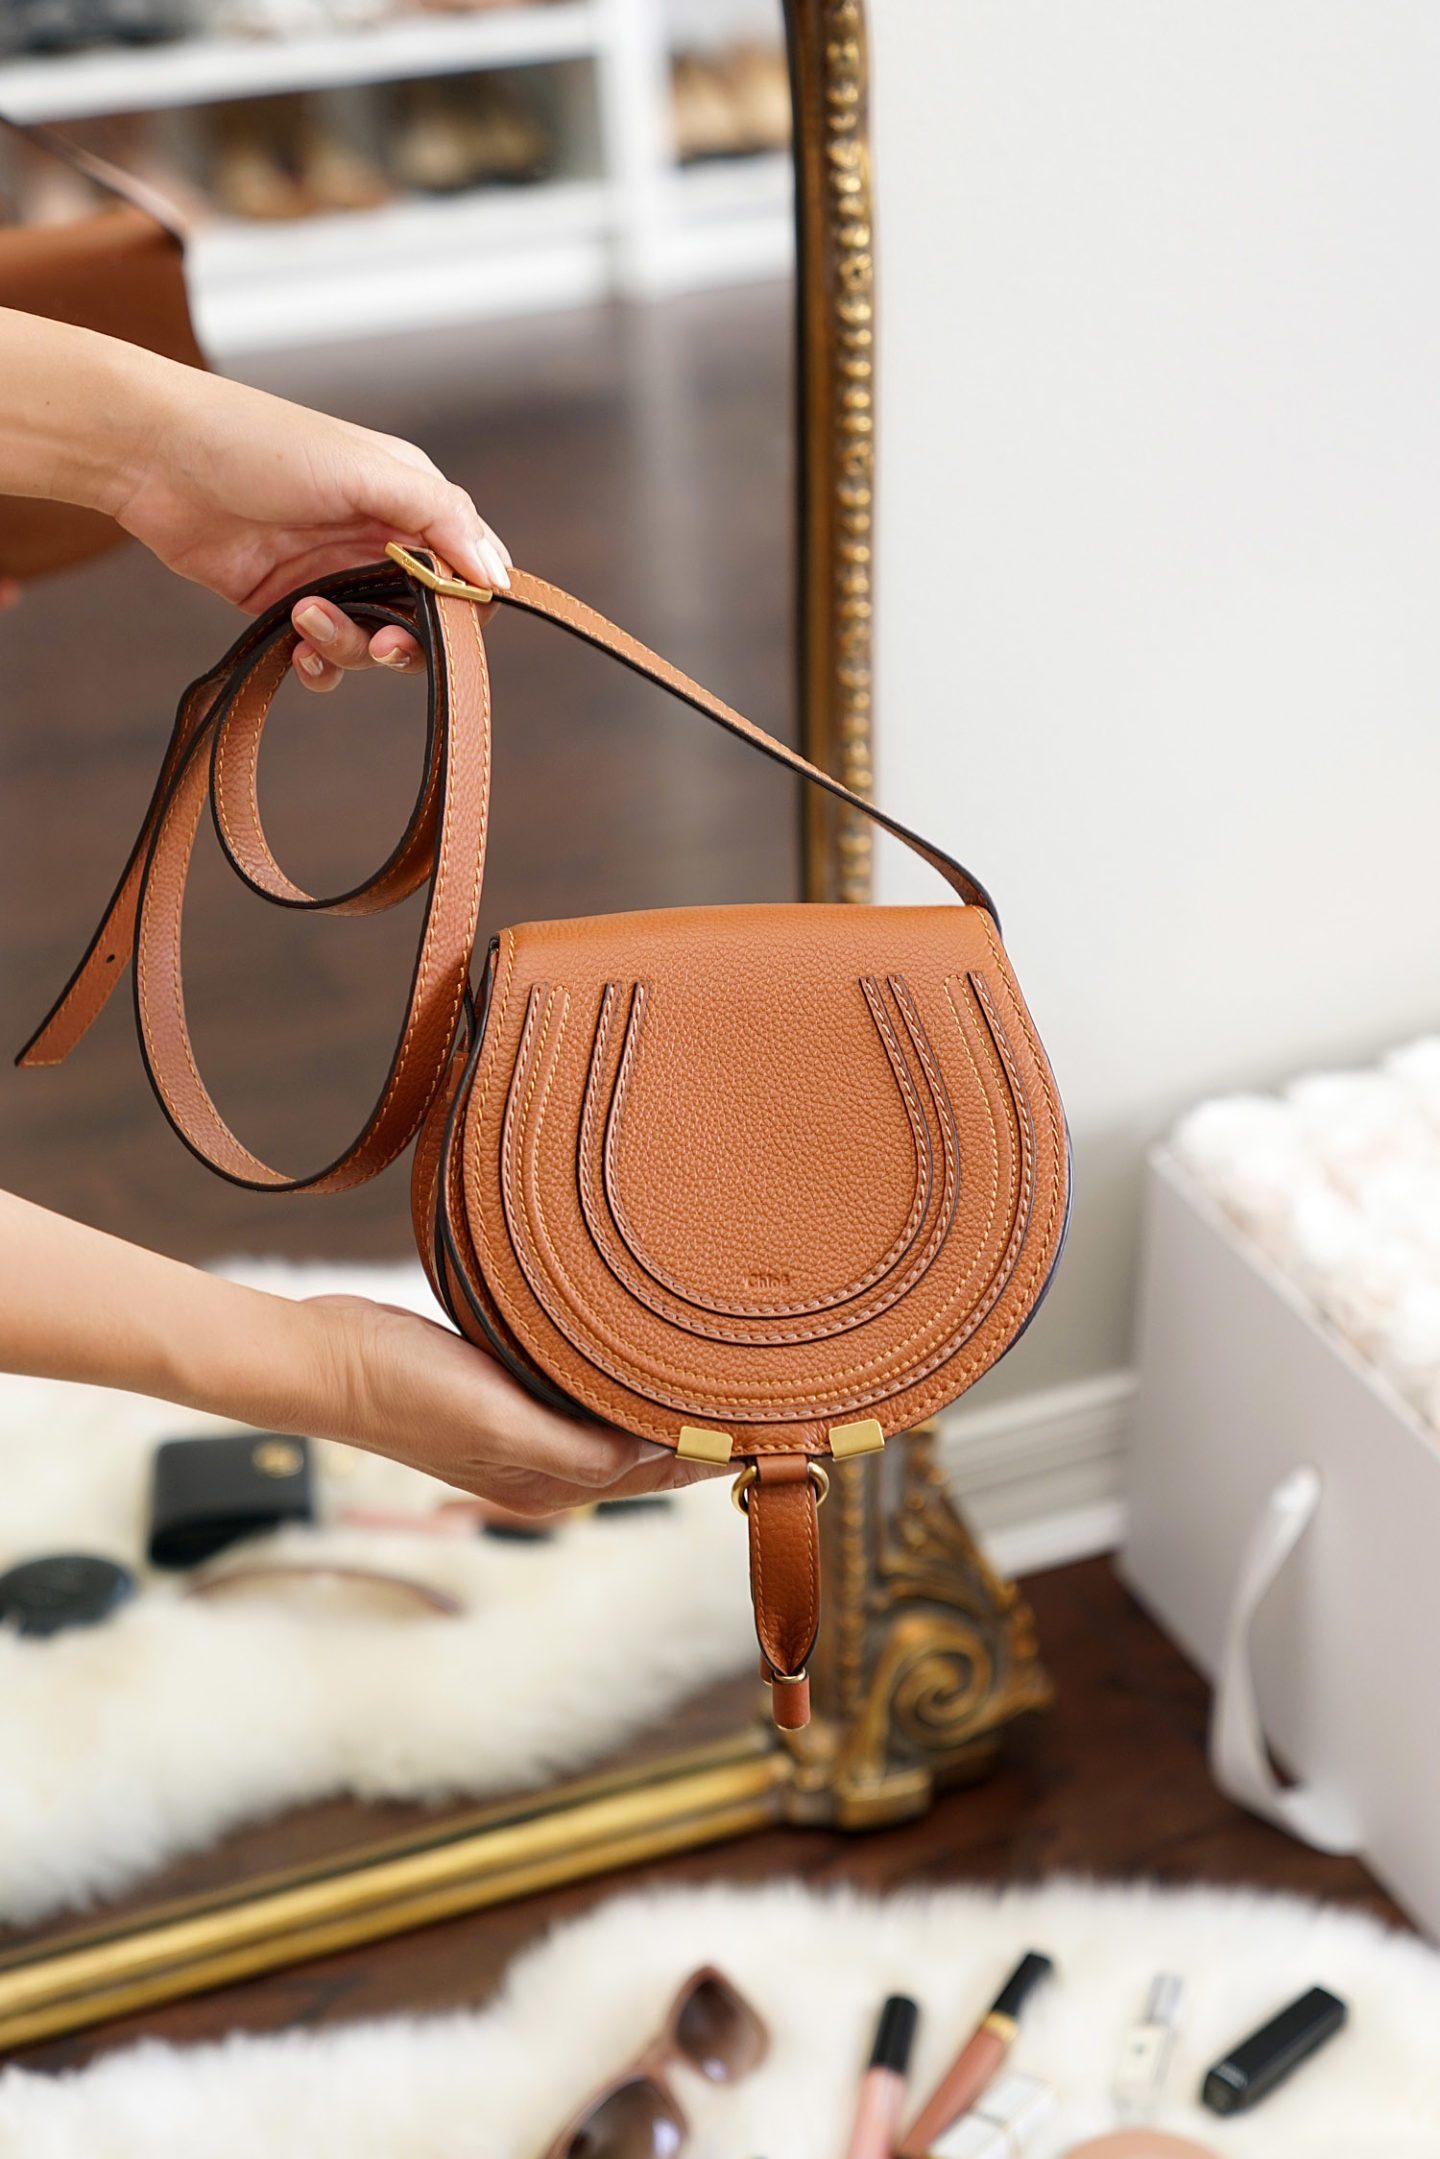 Chloe Mini Marcie Bag Review Tan | The Beauty Look Book